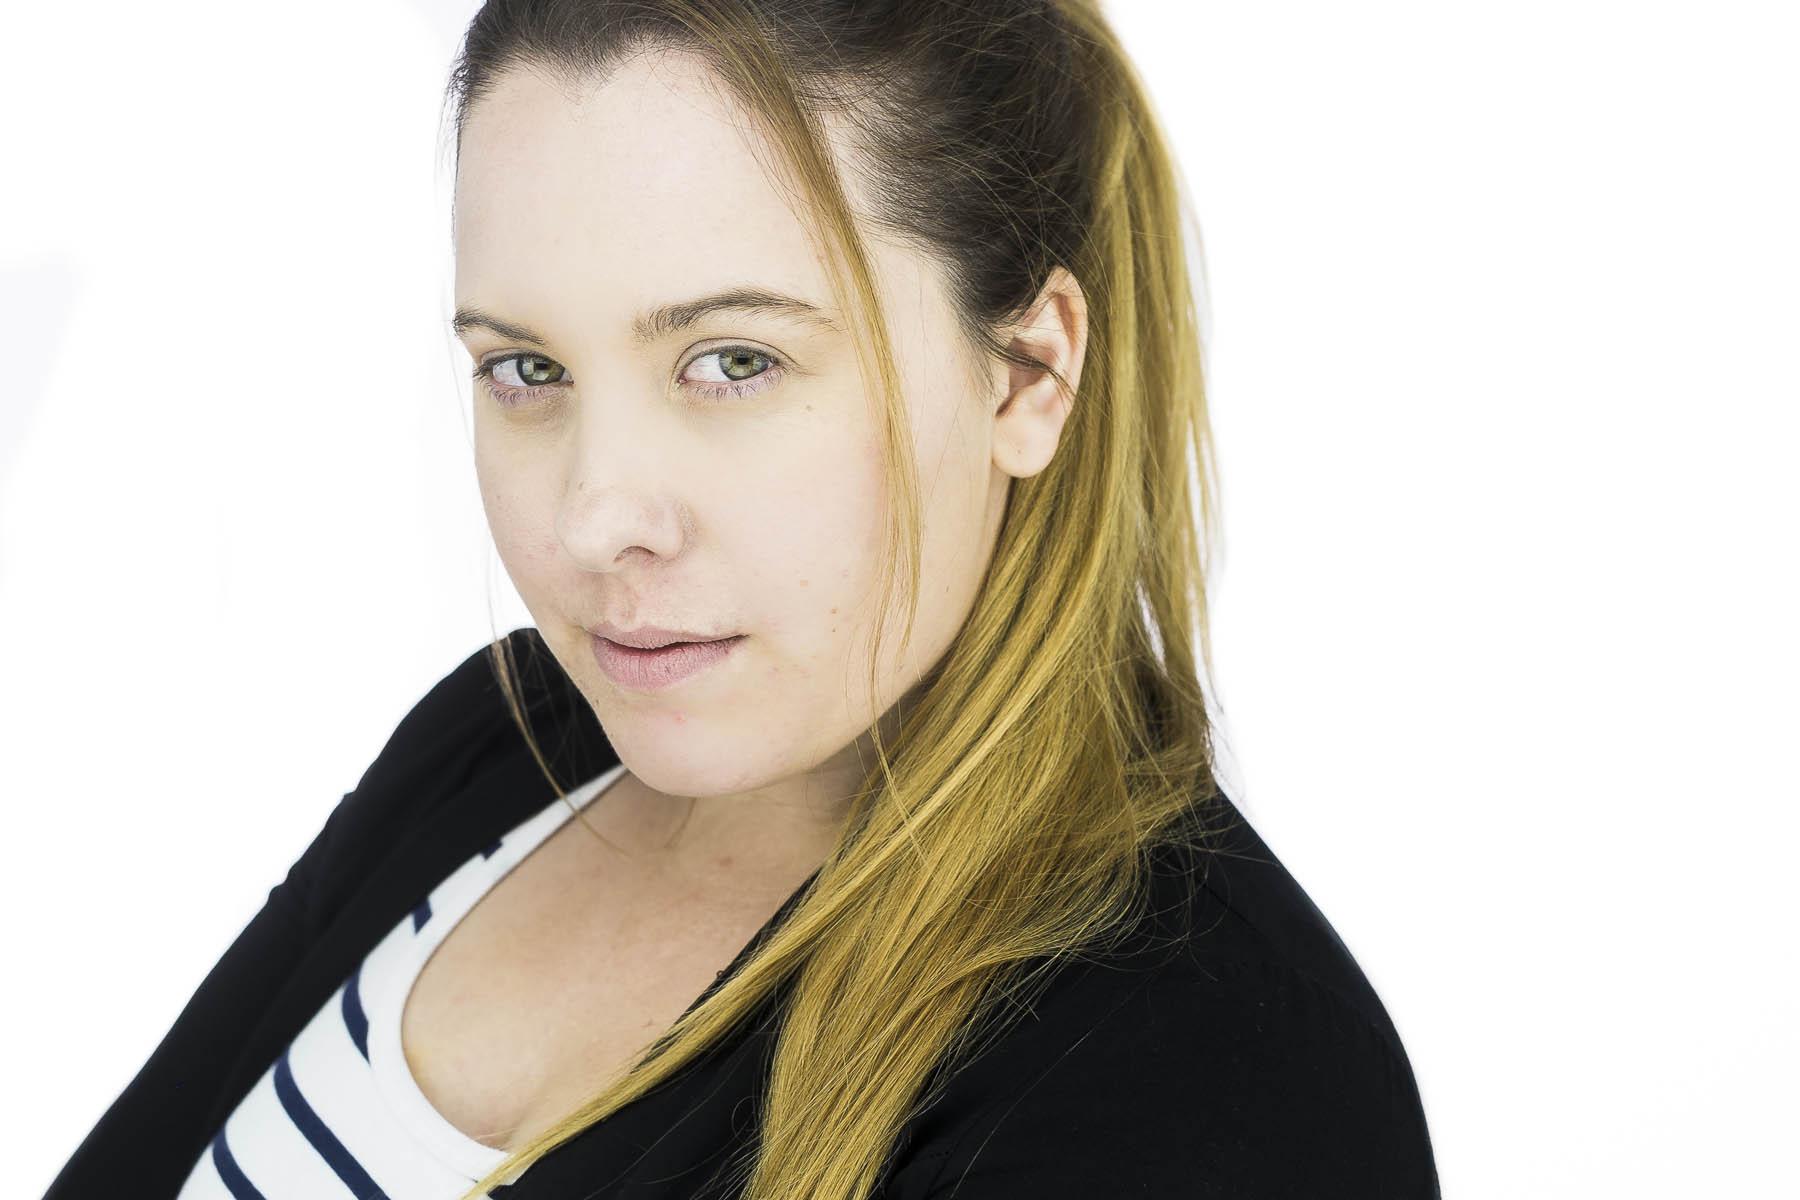 Rachel-a-headshot-session-adelaide-30 (2).jpg